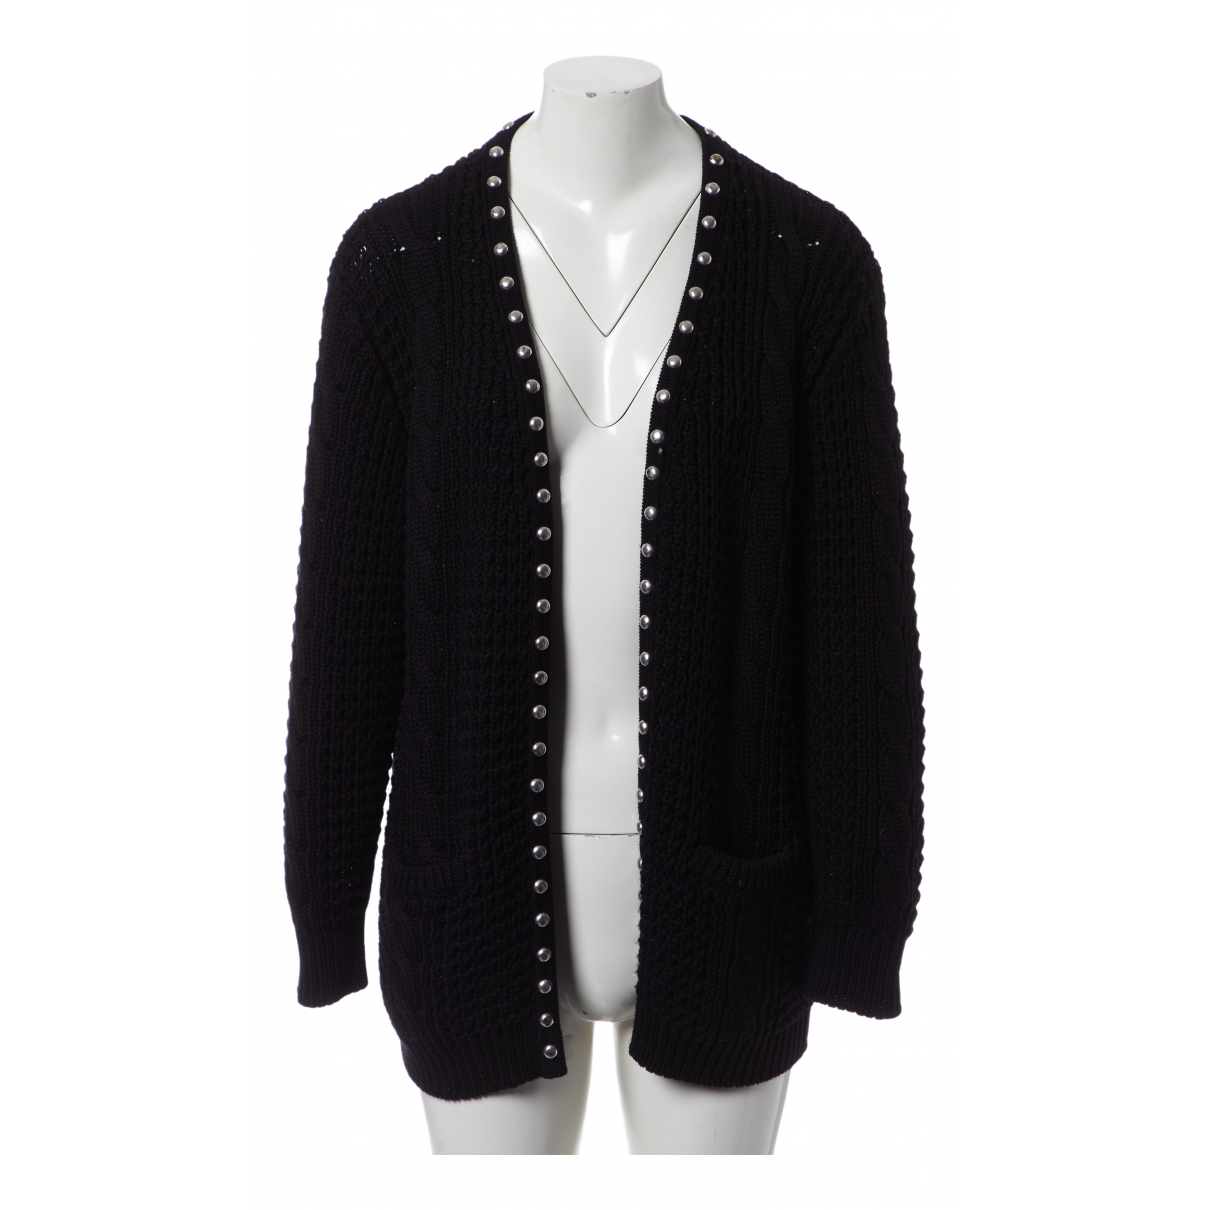 Saint Laurent \N Black Cotton Knitwear for Women M International